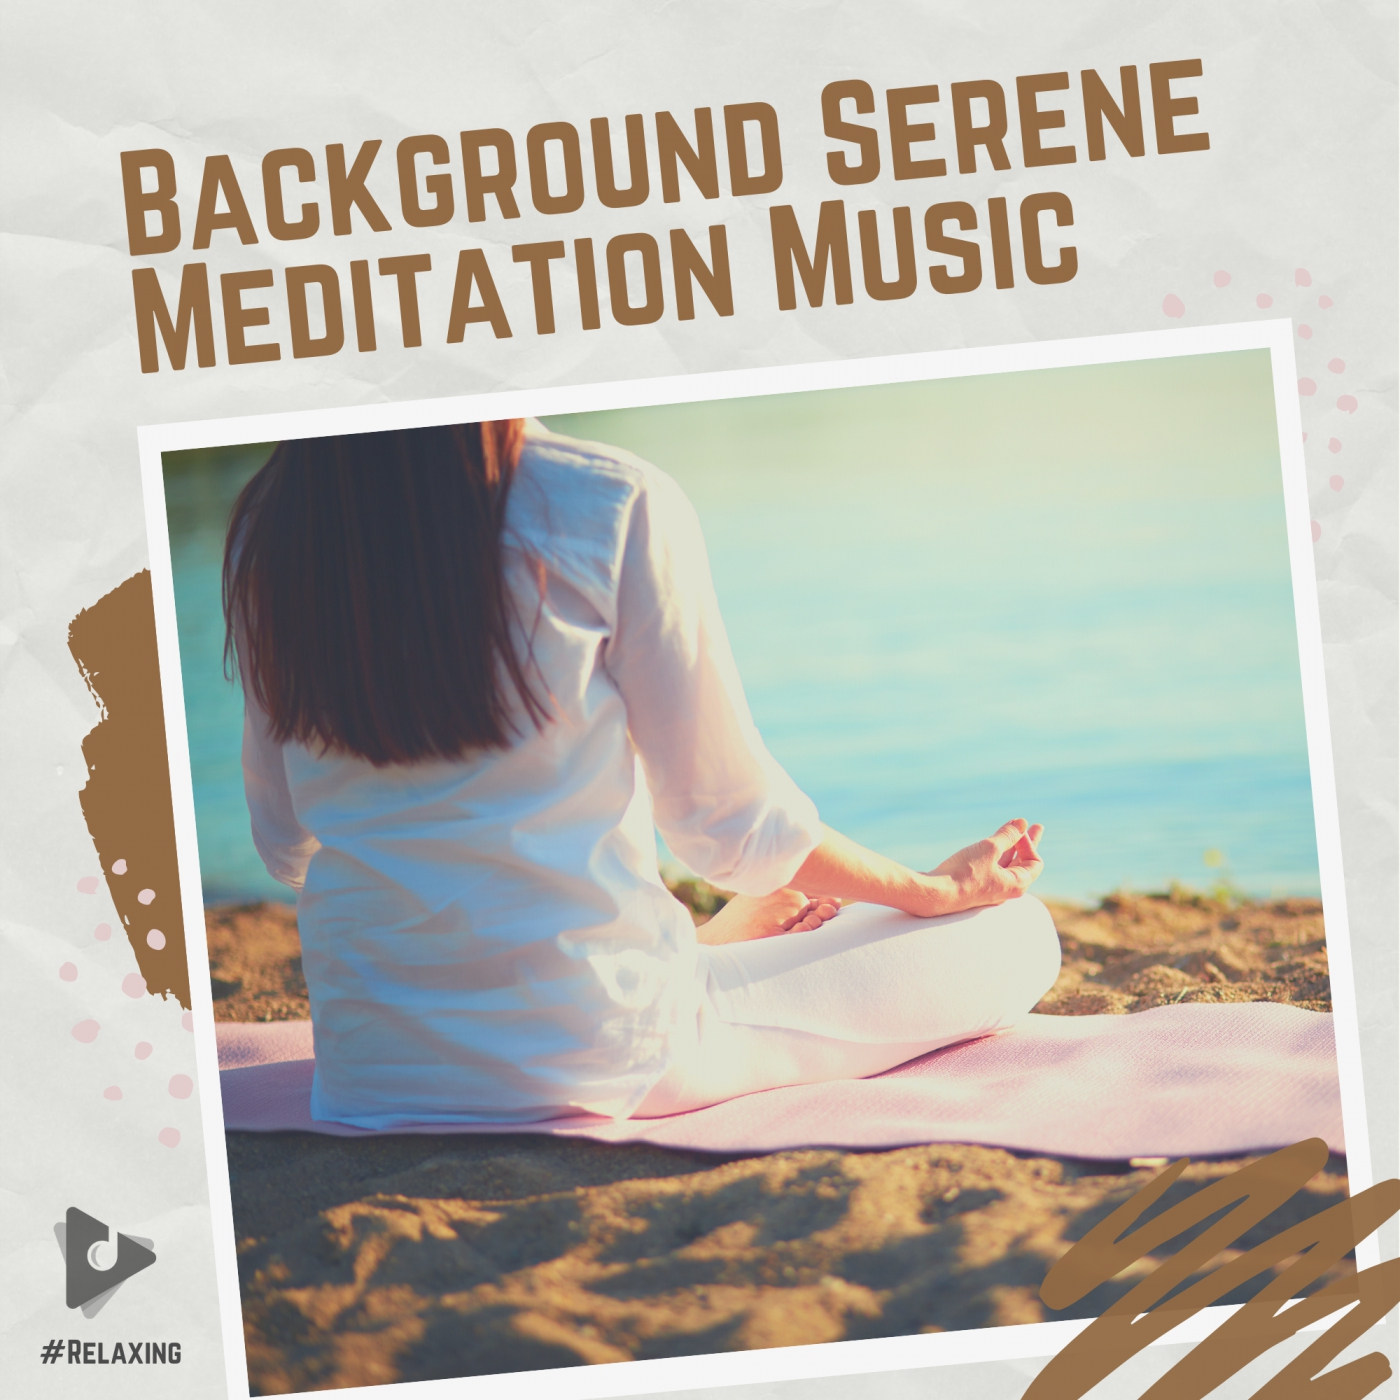 Background Serene Meditation Music